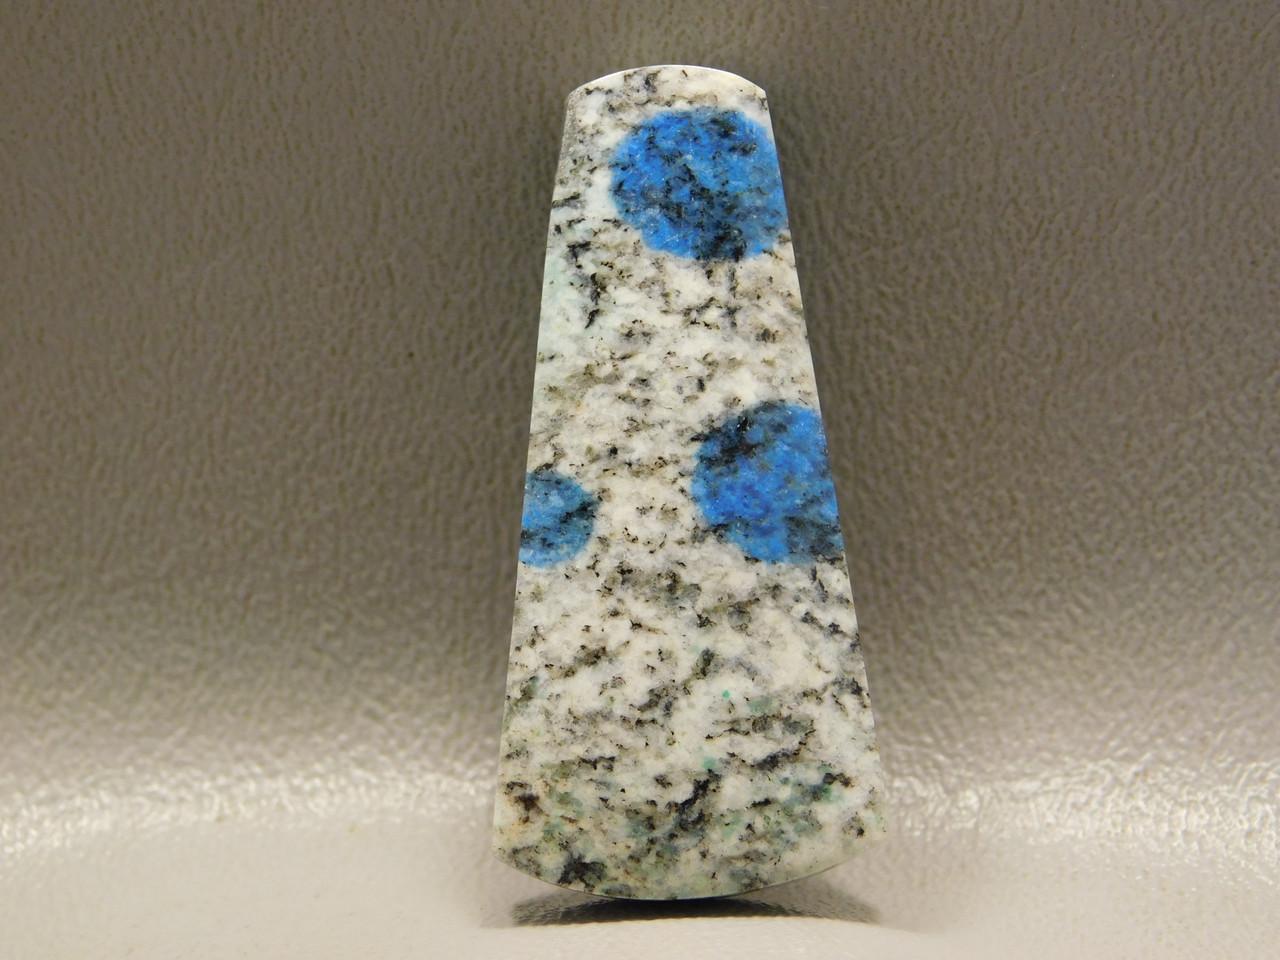 K2 Azurite Granite Stone Bead Pendant #8